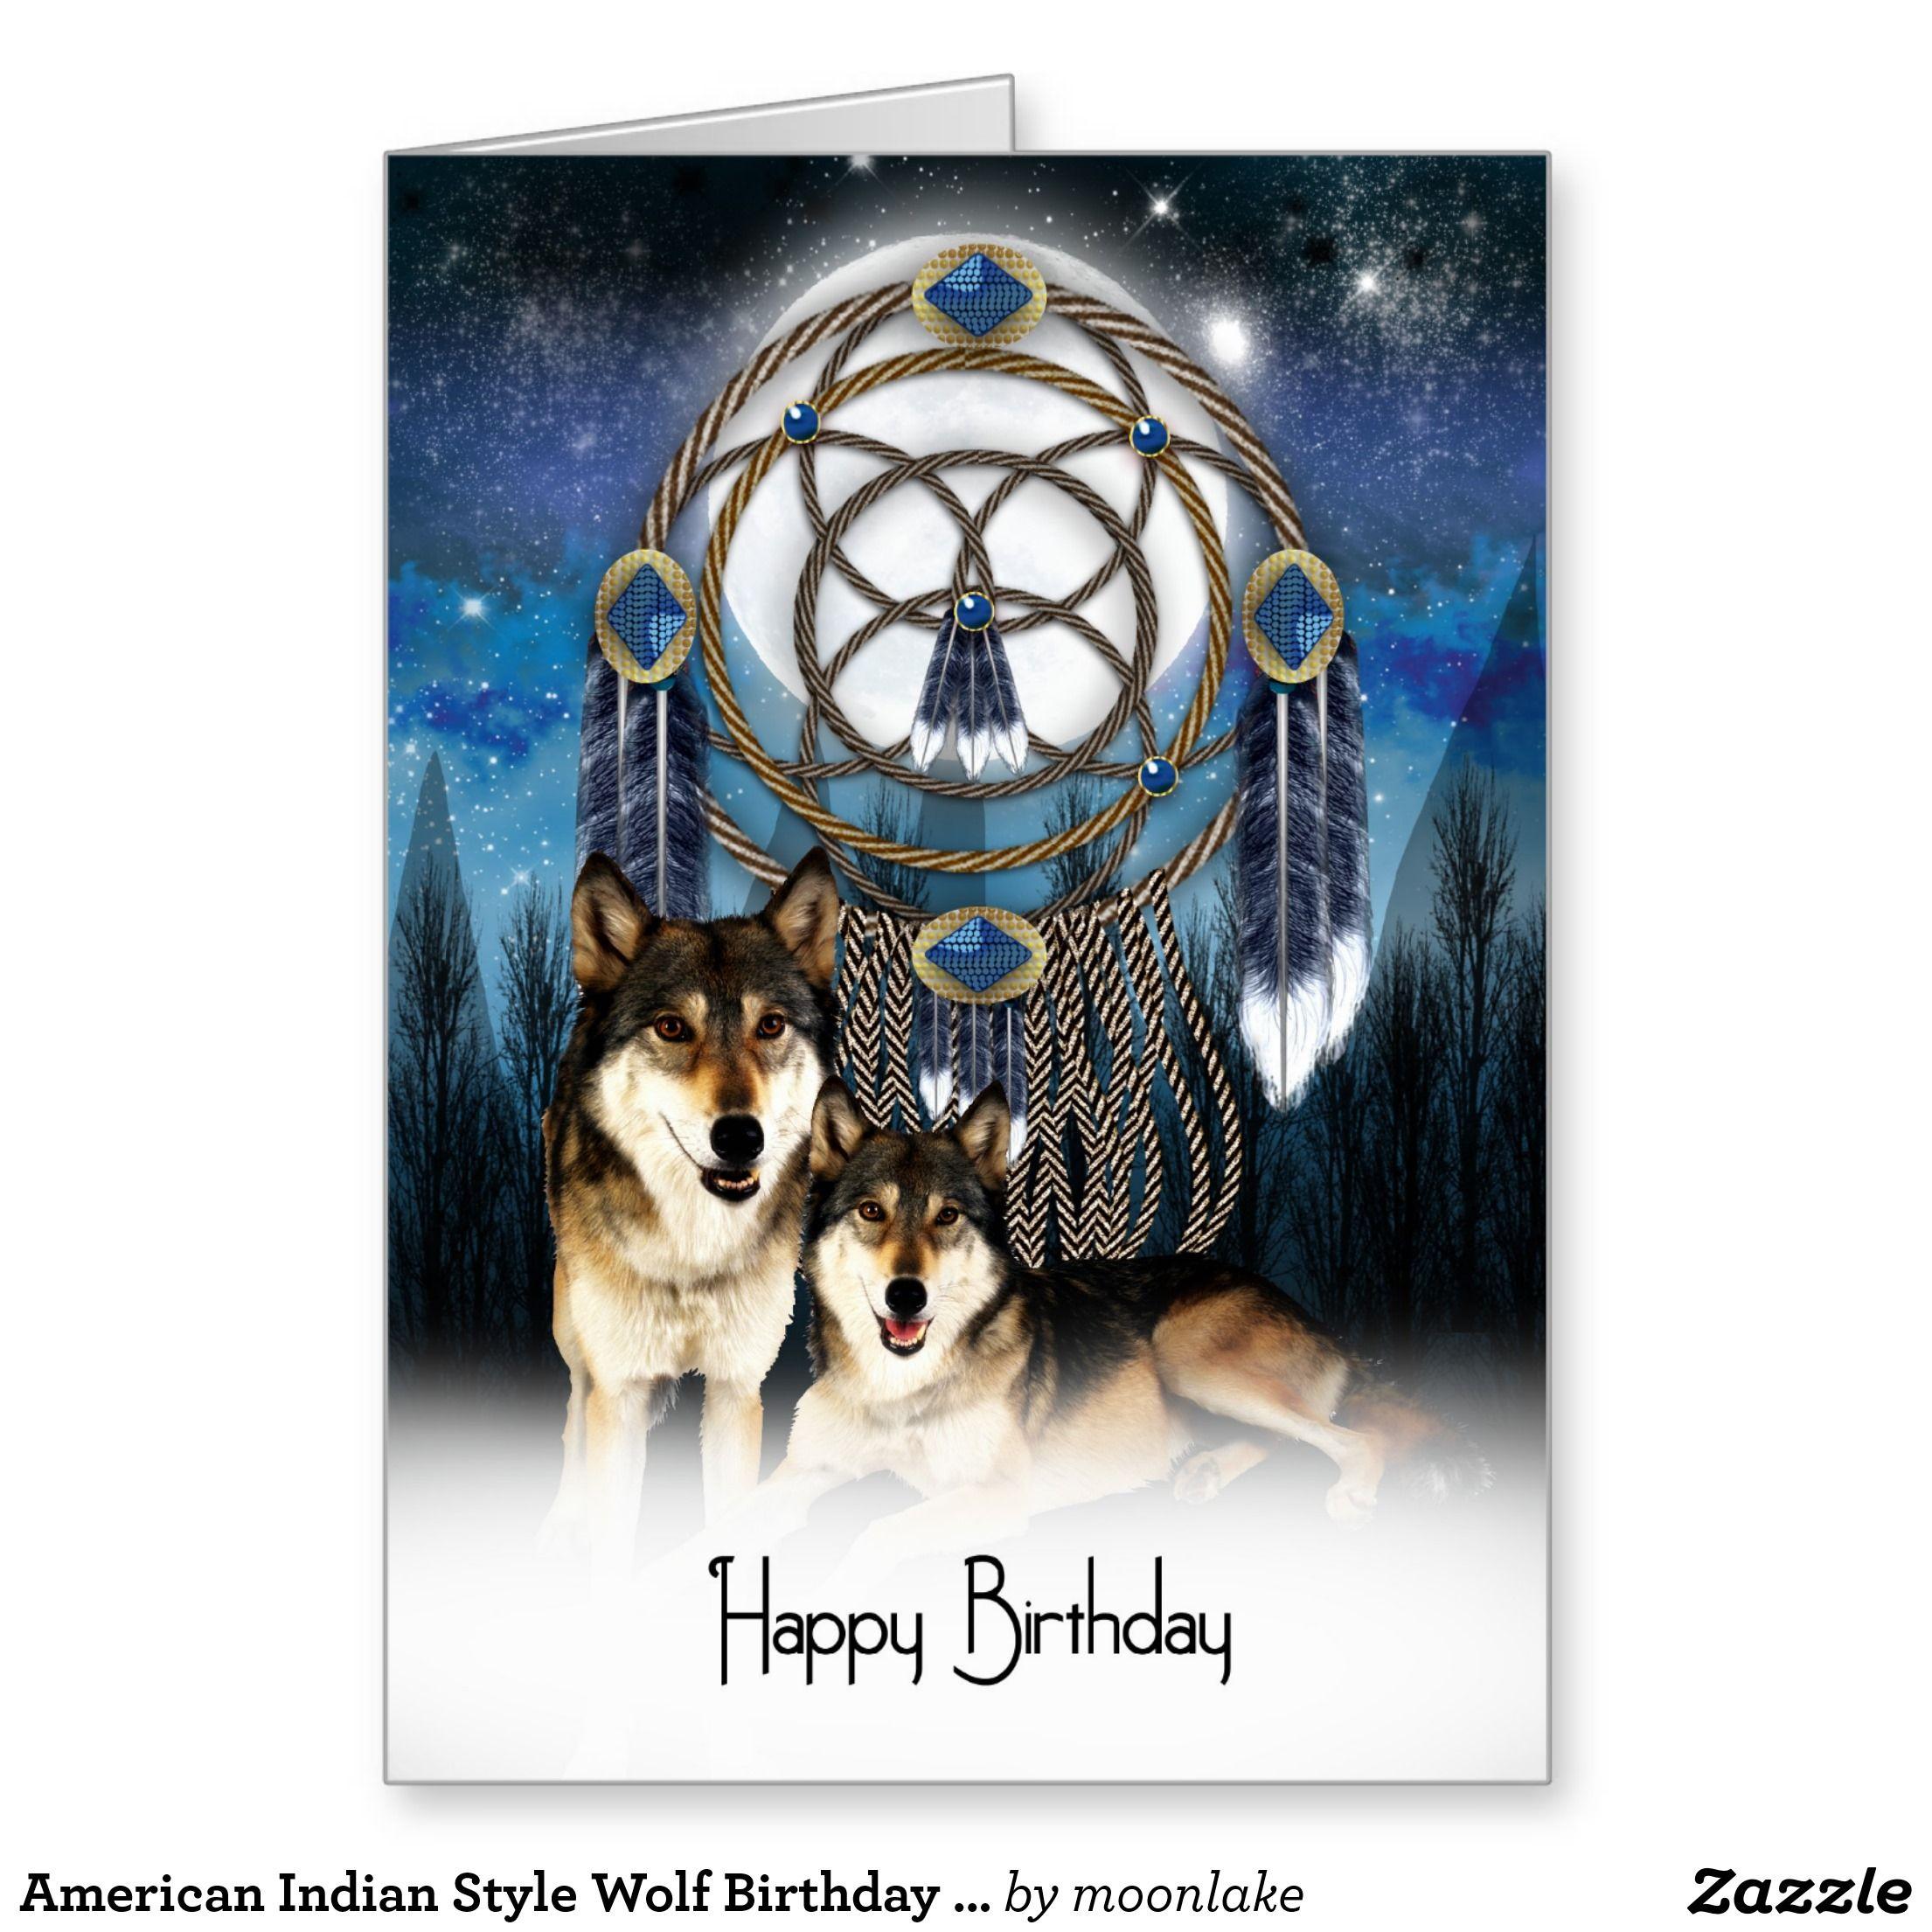 American Indian Greeting Cards Gallery Greetings Card Design Simple